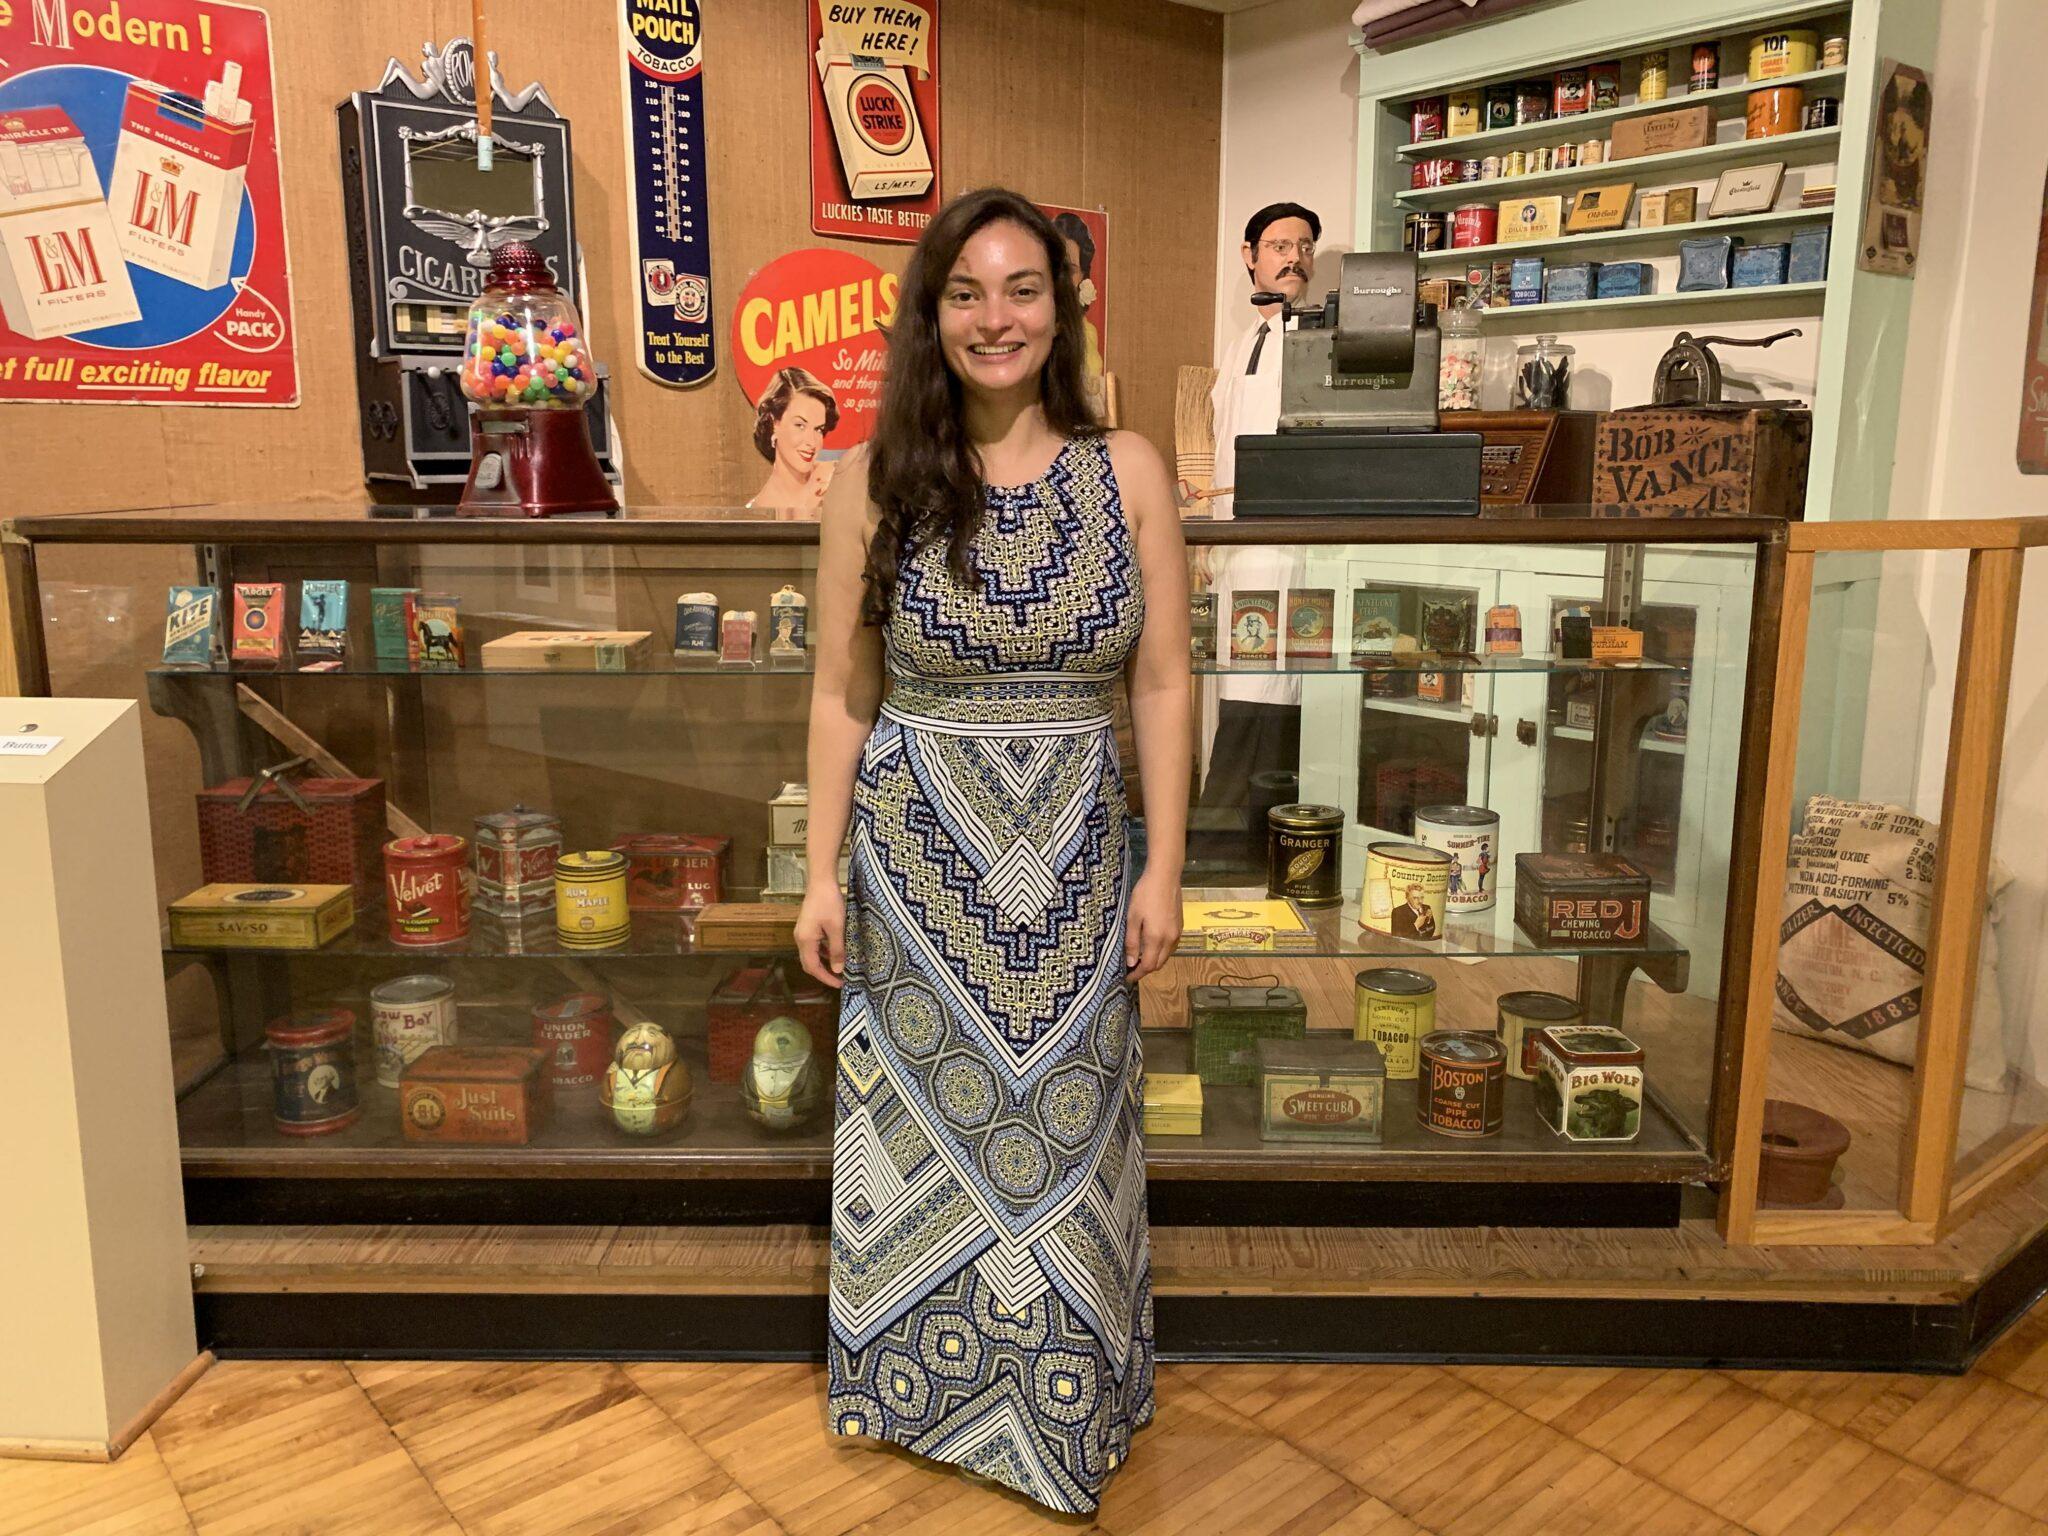 Tobacco museum display